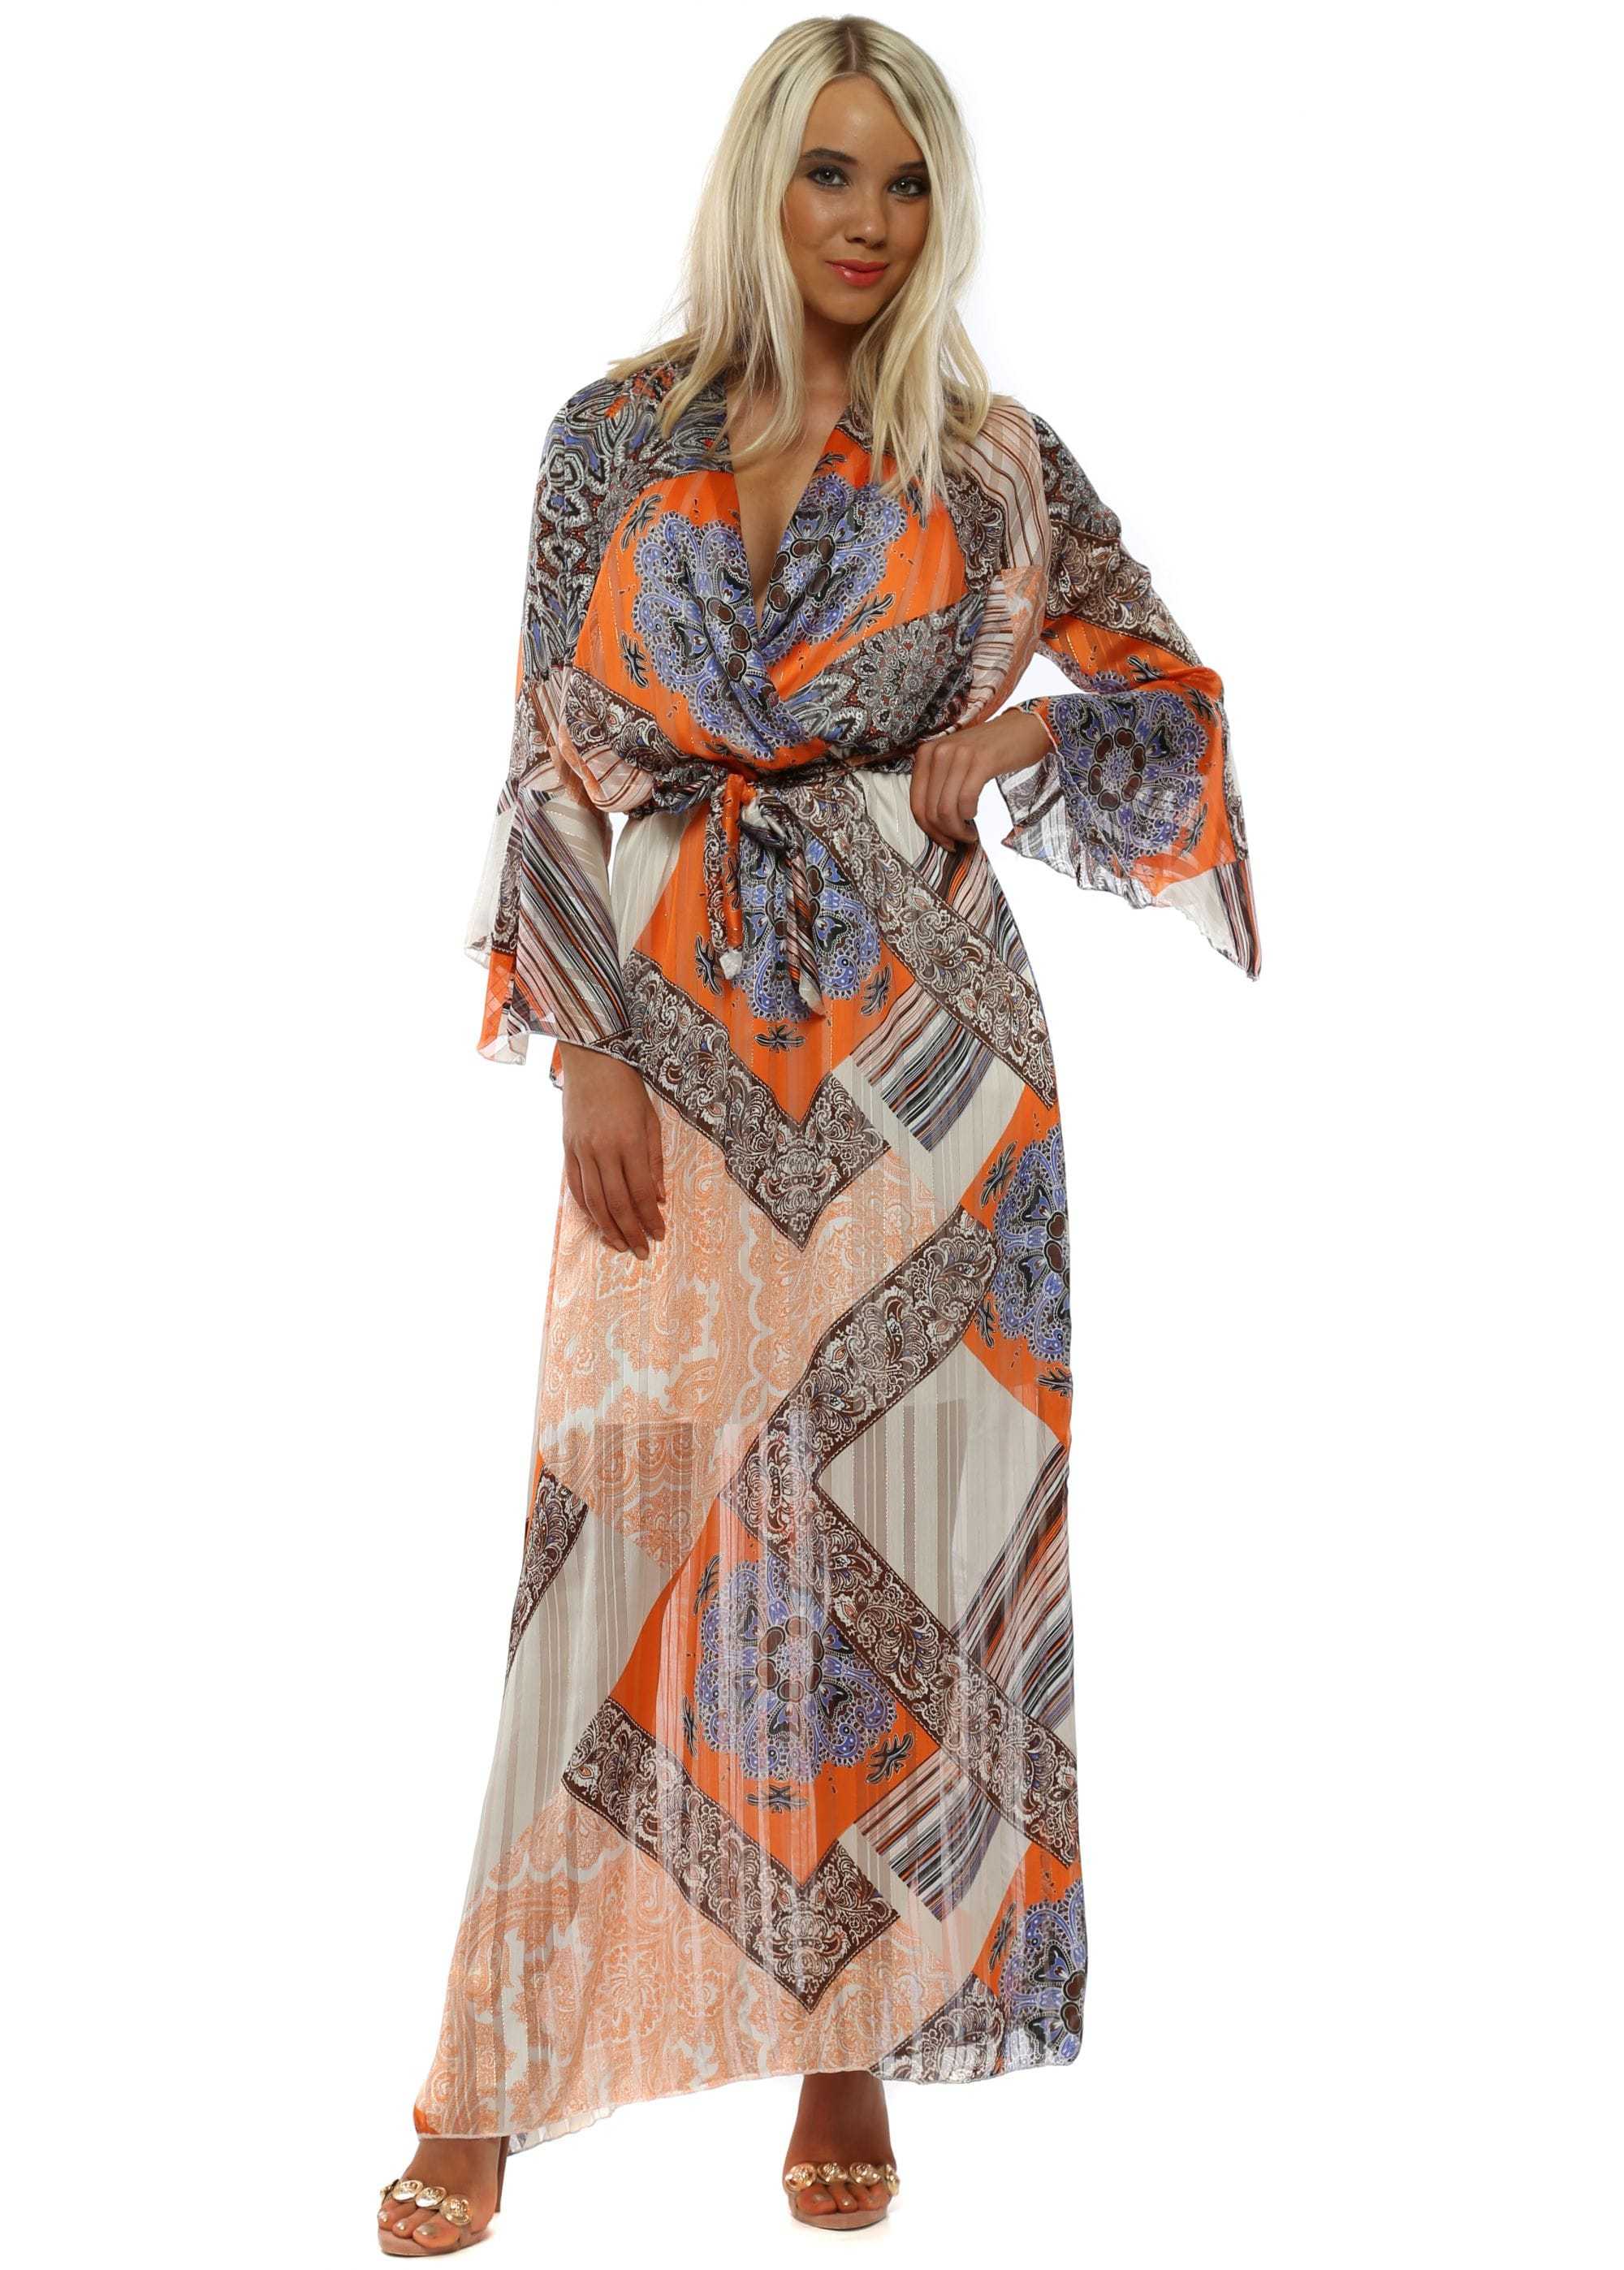 67c7b9133c60 Chiffon Maxi Dress | Long Sleeve Maxi Dress | Wedding Guest Maxi Dress